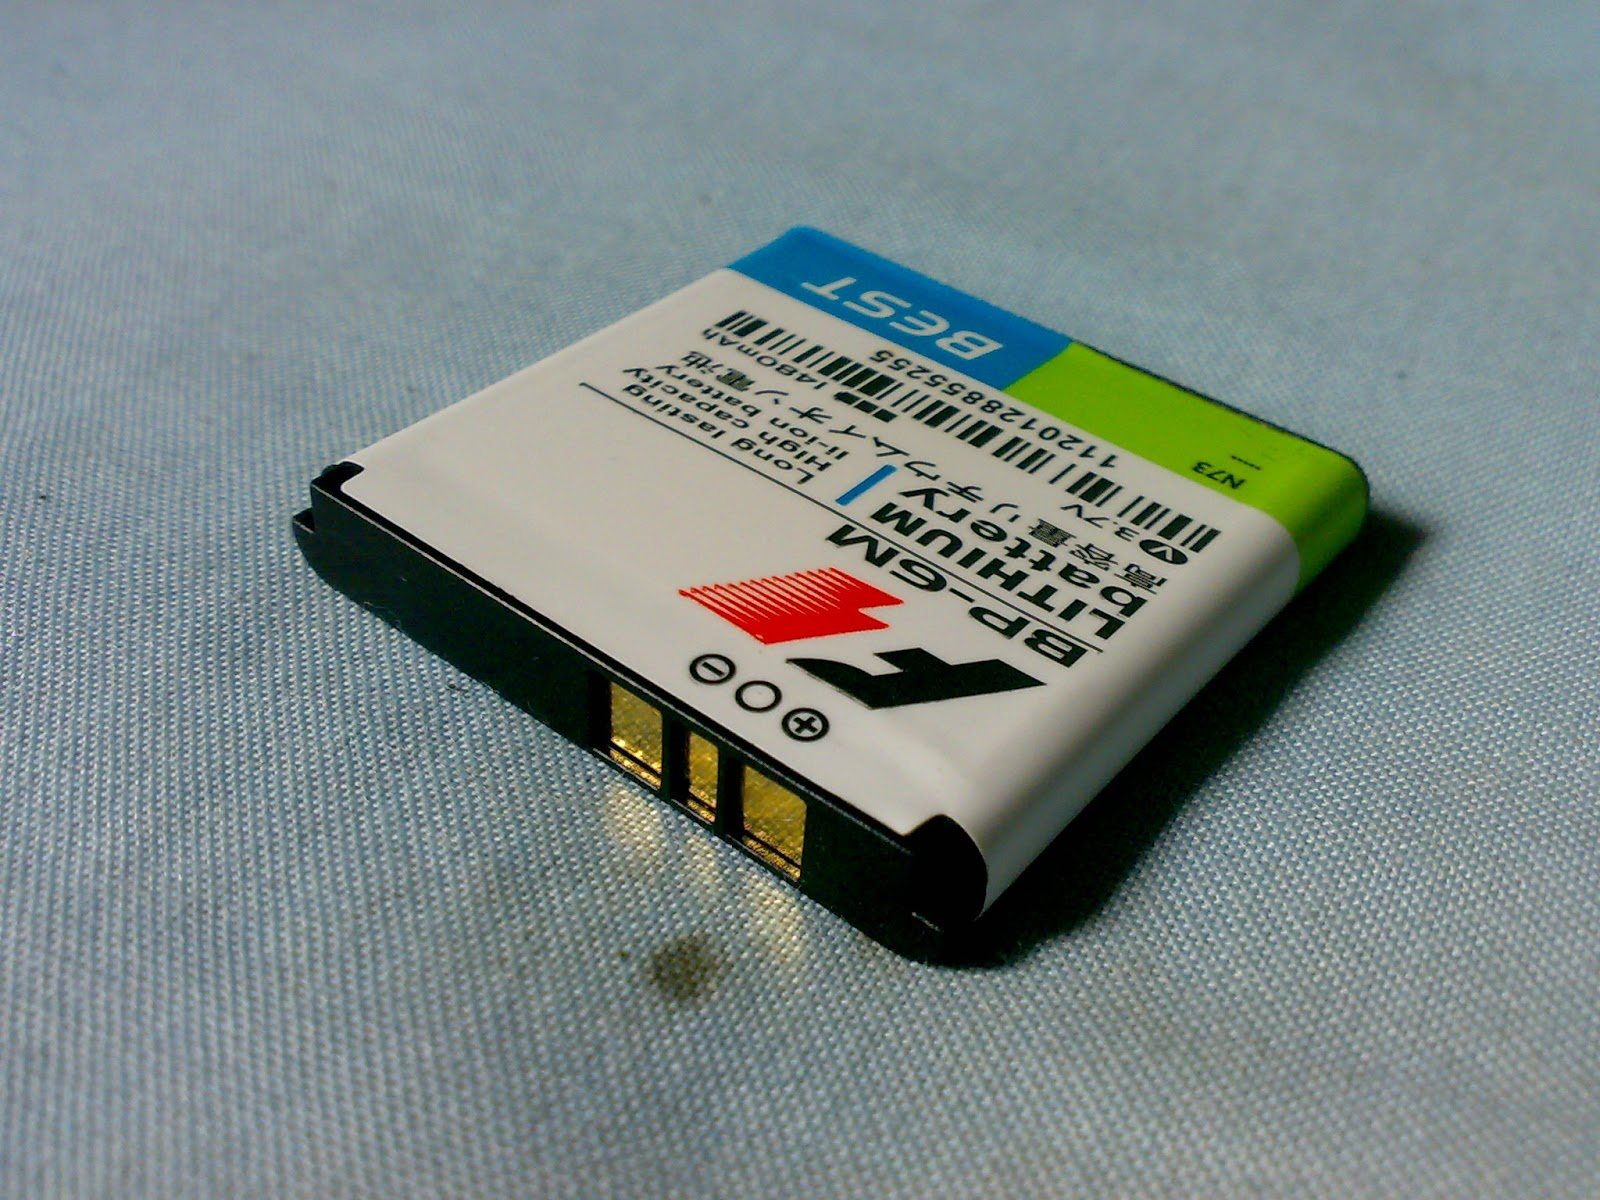 L Baterai Originalnya Berukuran  Mah Maka Dengan Type Yang Sama Baterai Double Power Ada Yang Berkapasitas